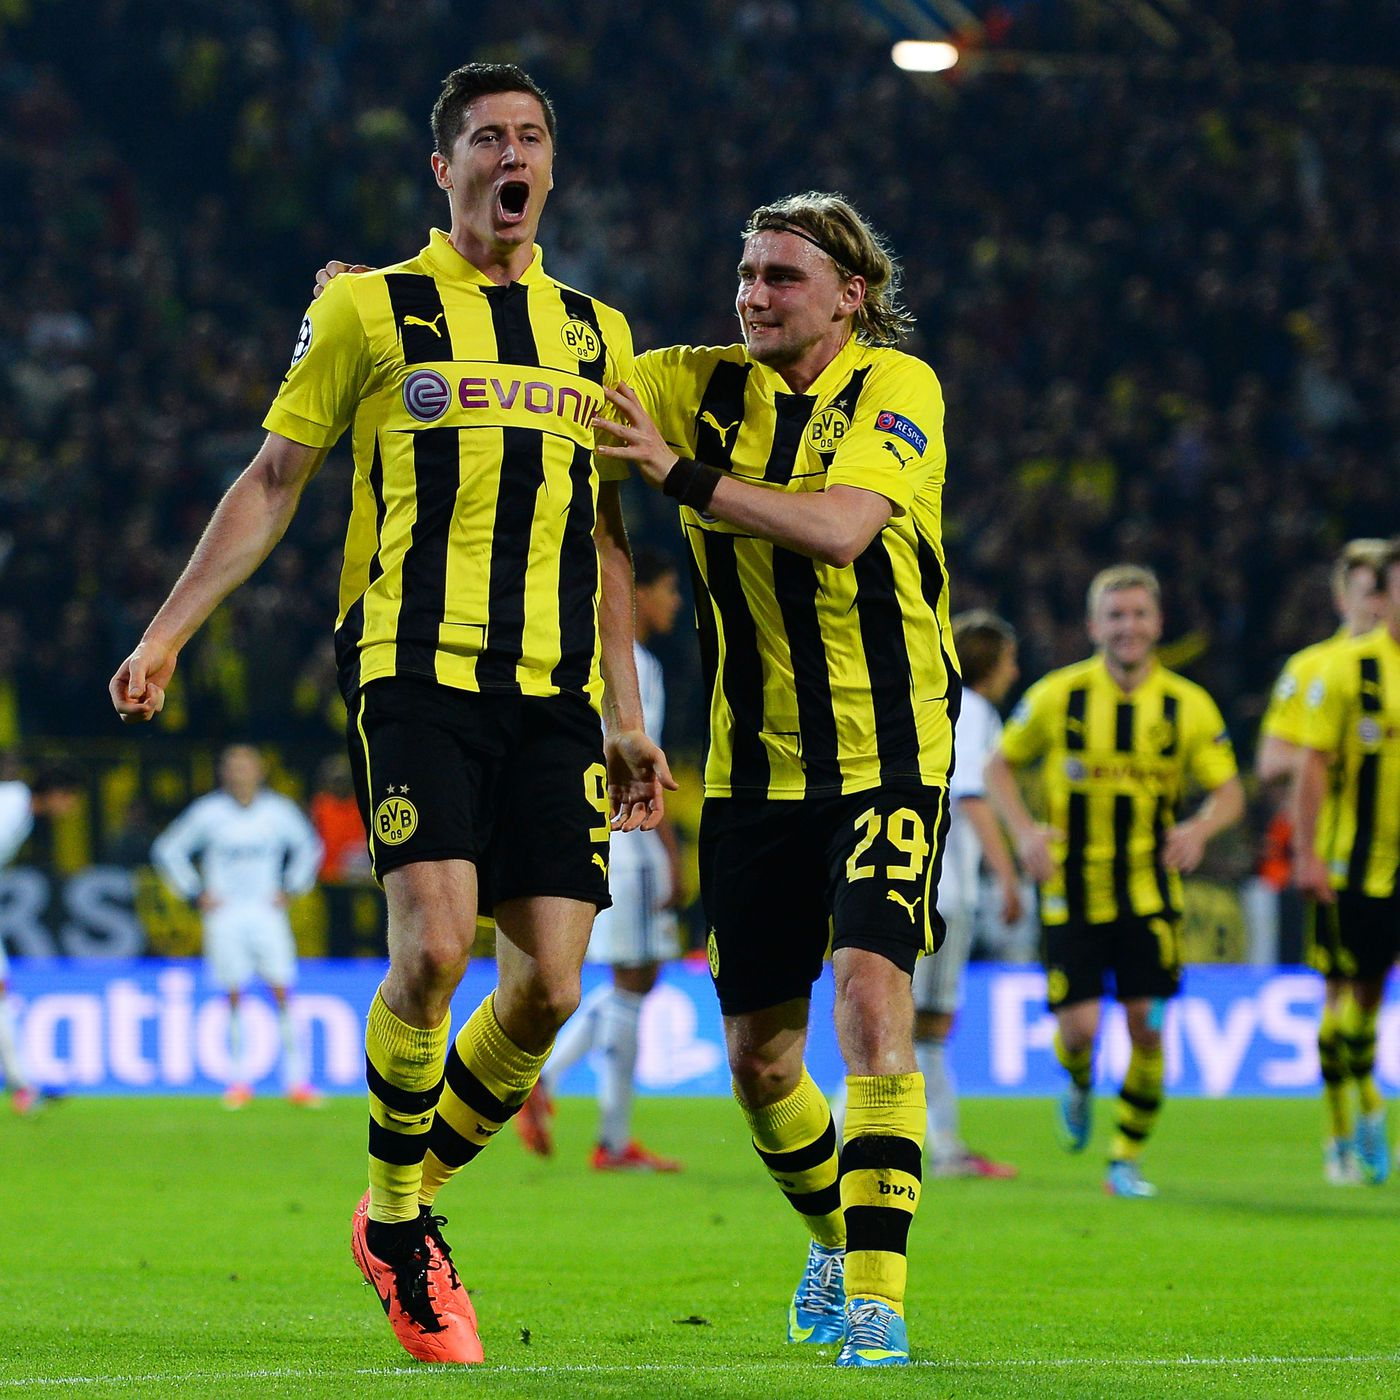 Borussia Dortmund Vs Real Madrid UEFA Champions League Final Score Robert Lewandowski The Star SBNation com